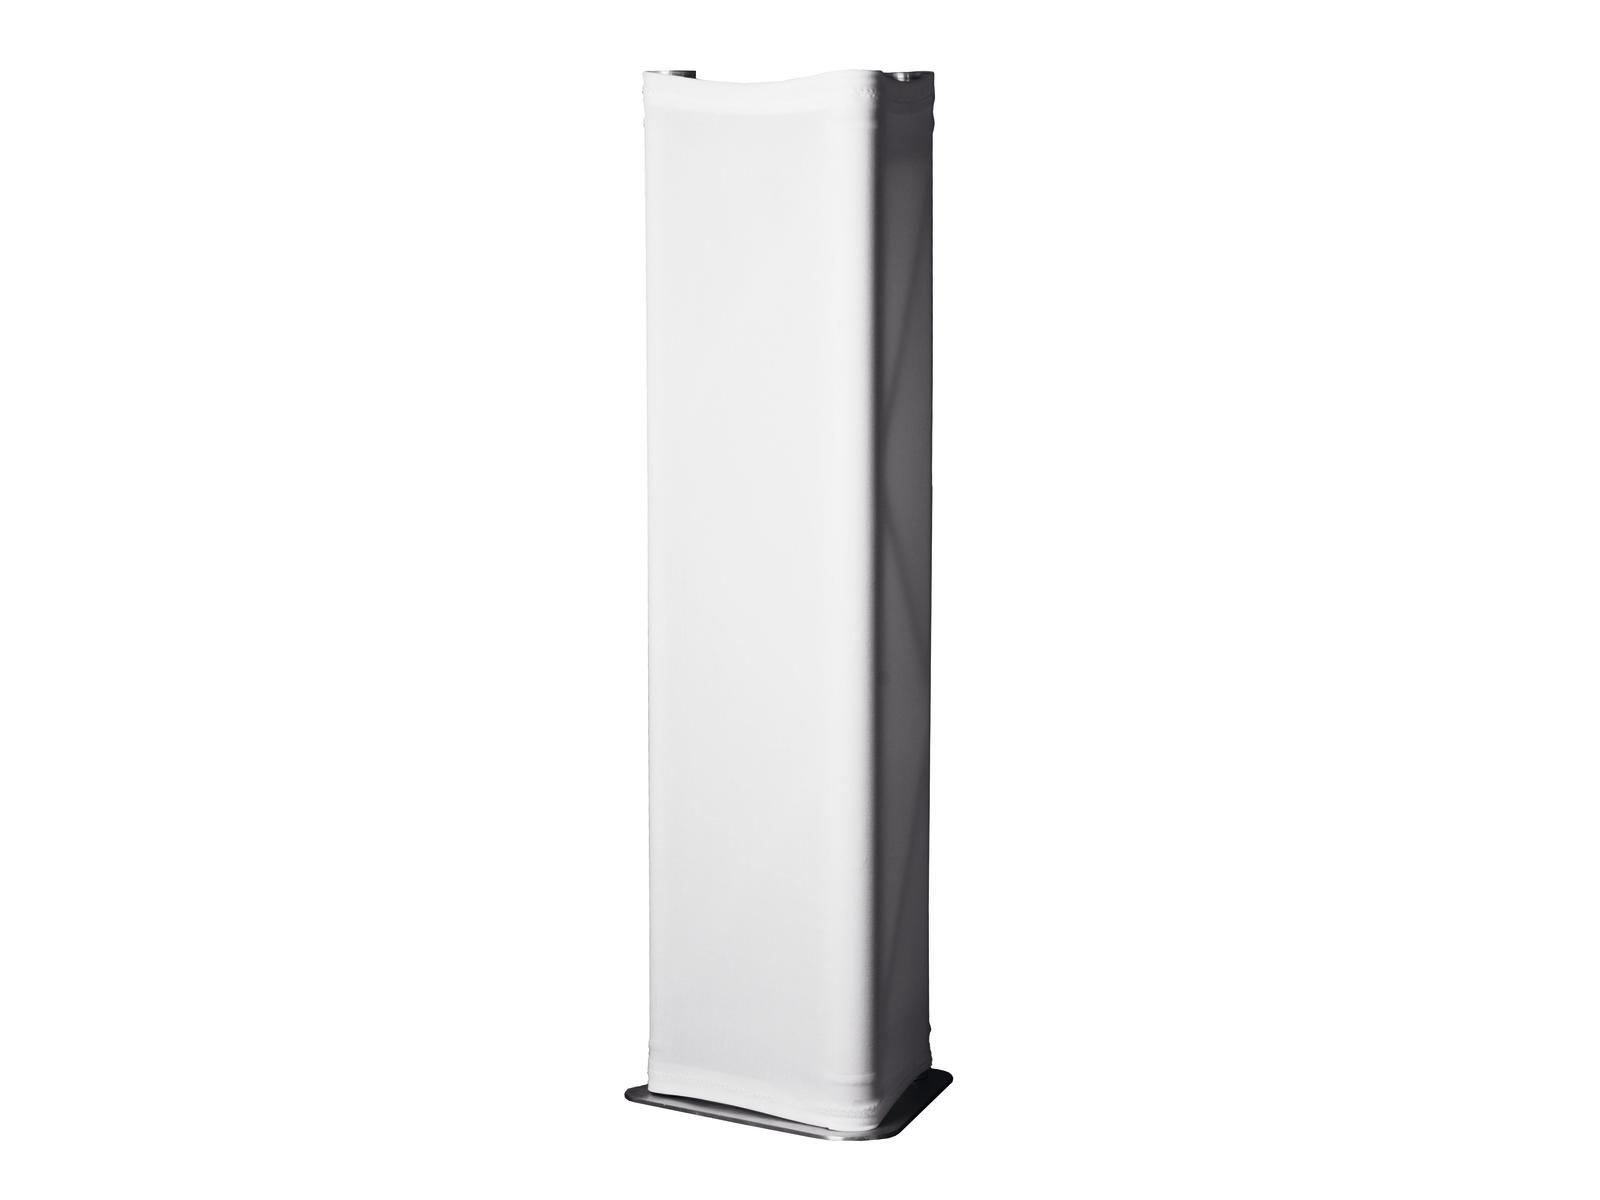 ESPANDERE XPTC15KVW Capriata di copertura 150cm bianco